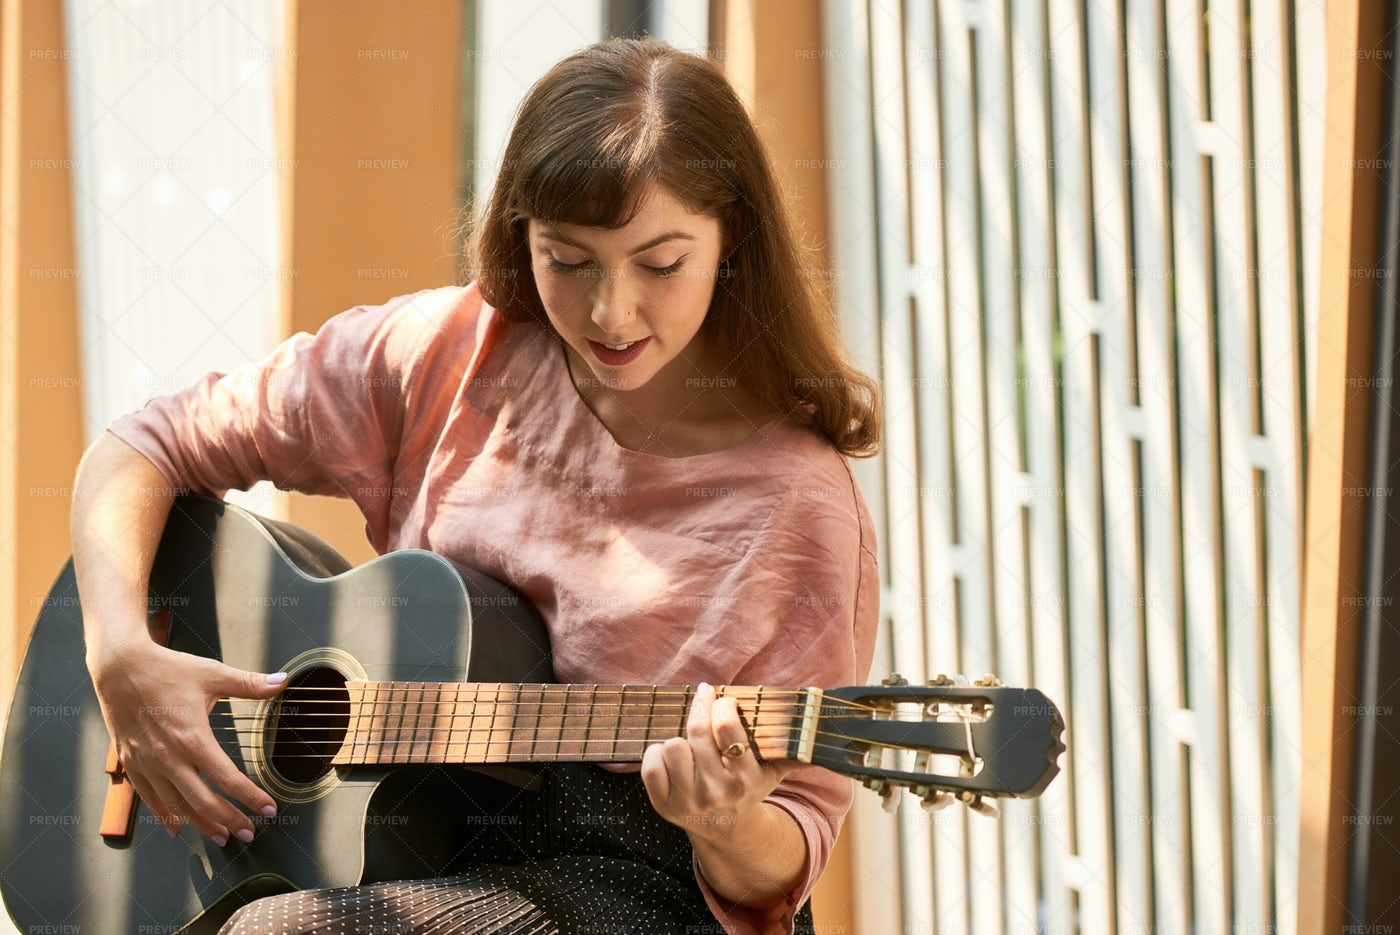 Creative Woman With Guitar: Stock Photos